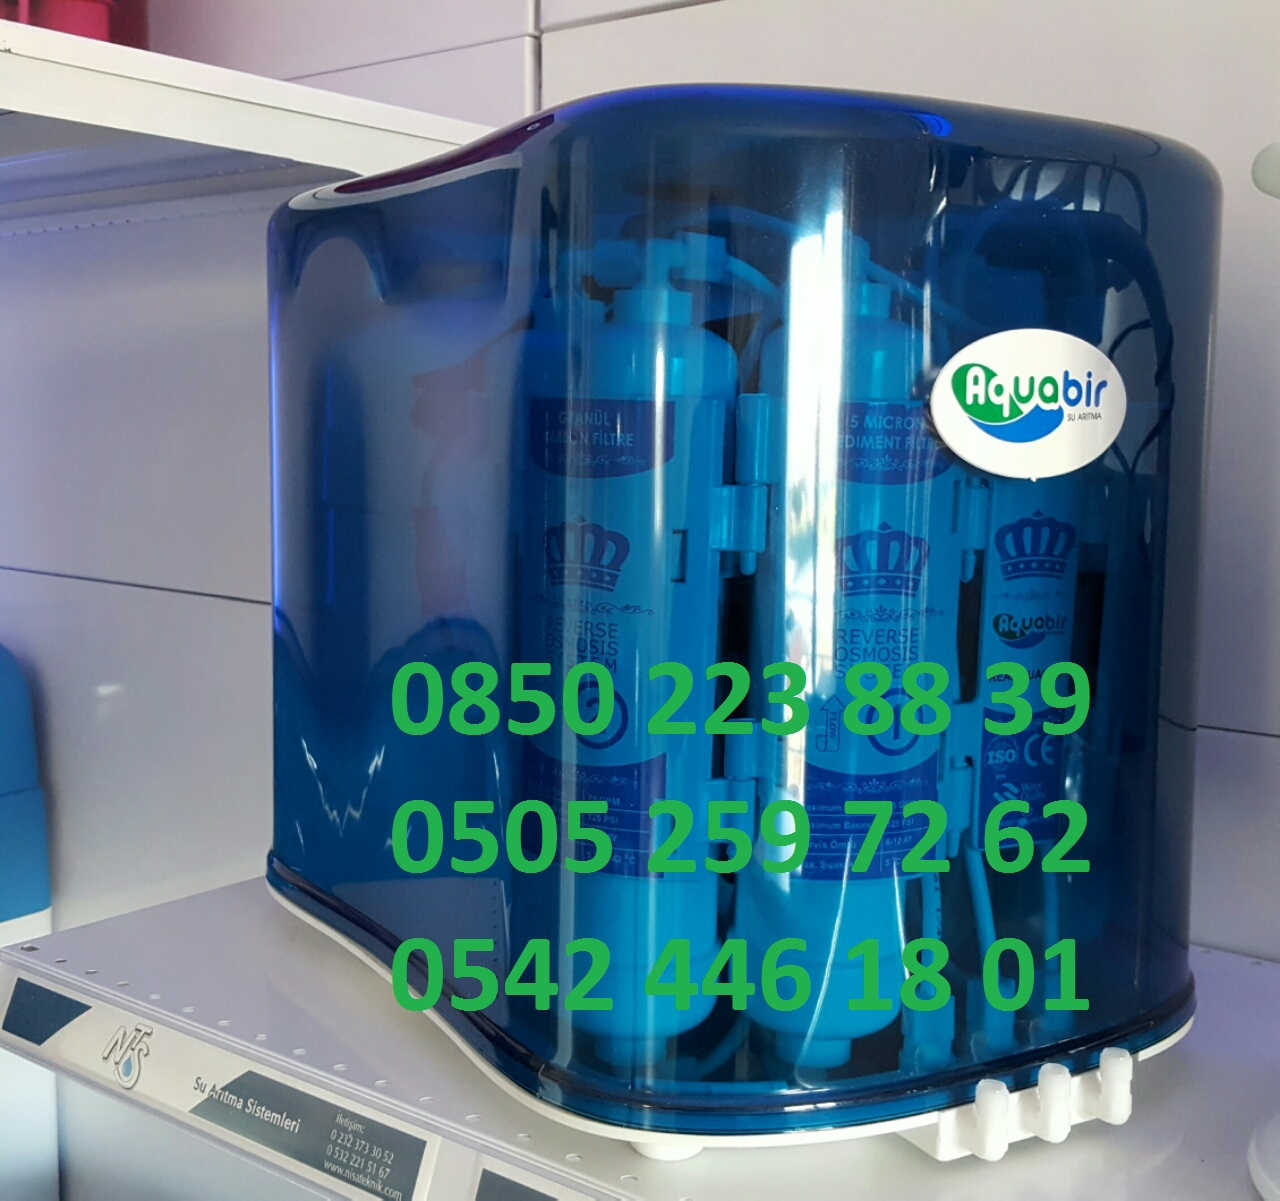 AquaBir Su Arıtma Servisi,AquaBir Su Arıtma Cihazı